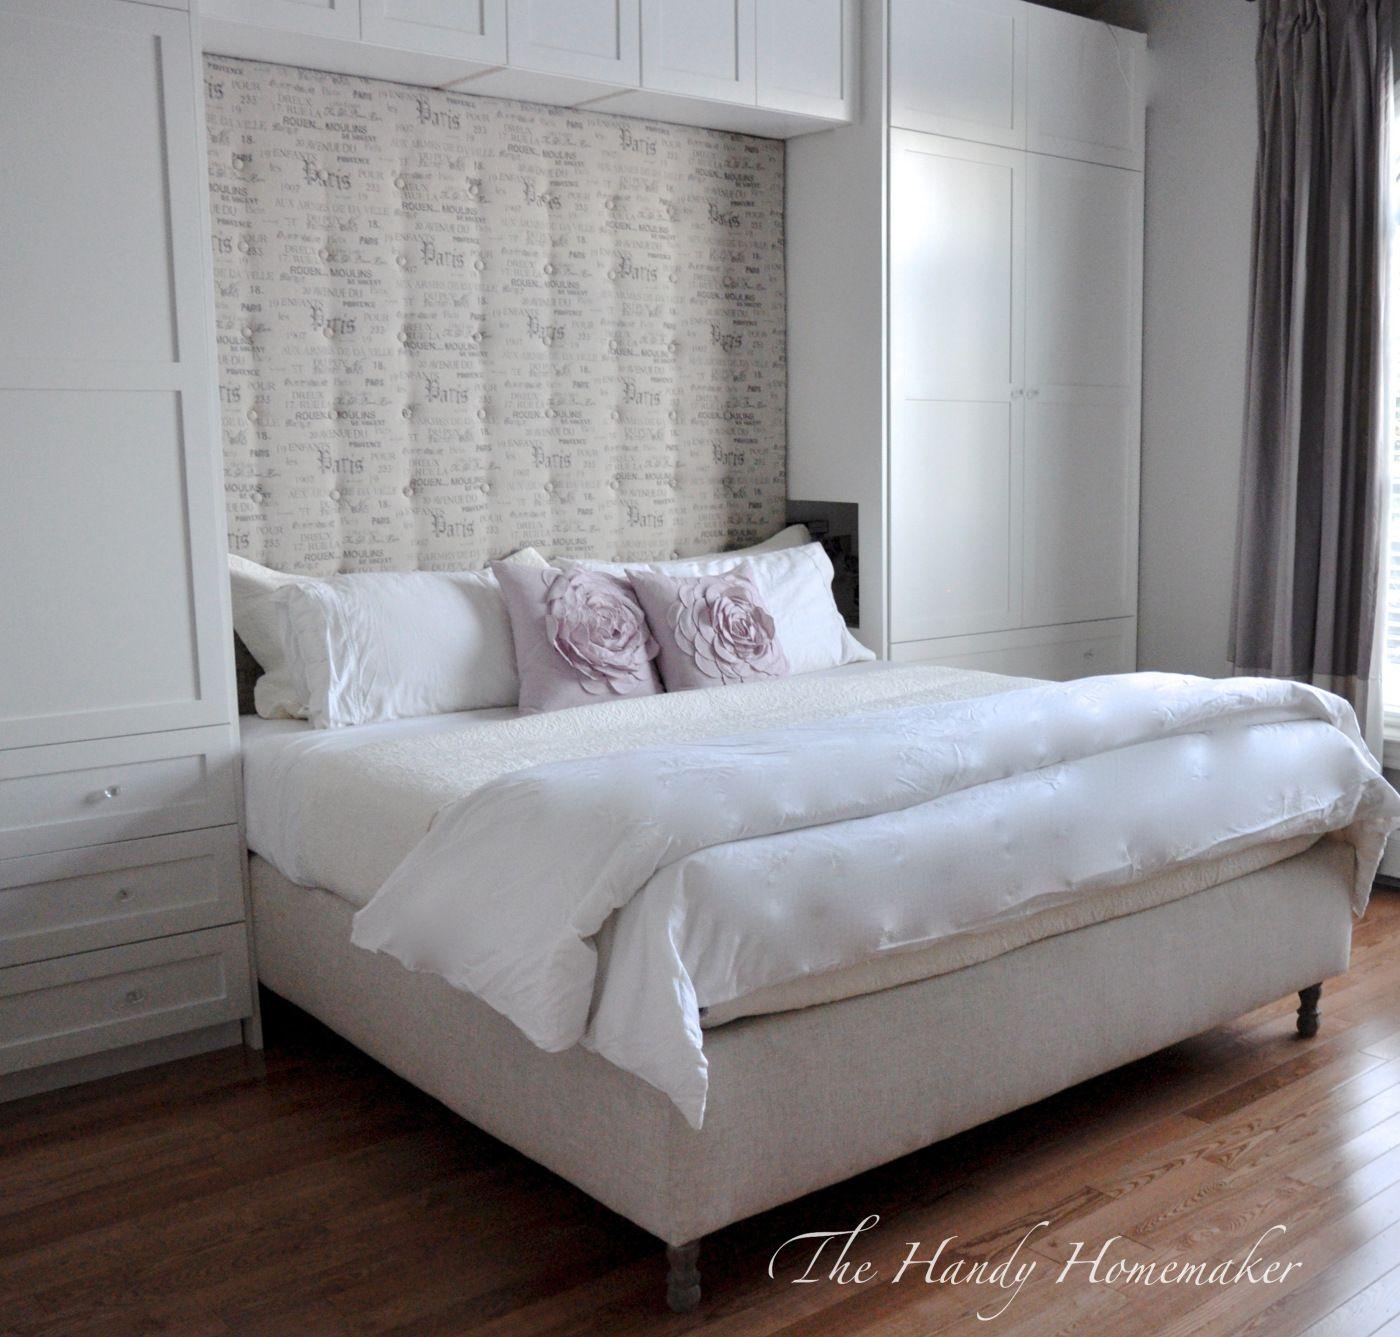 Upholstered Bedframe DIY Part 1 Cabeceira de cama